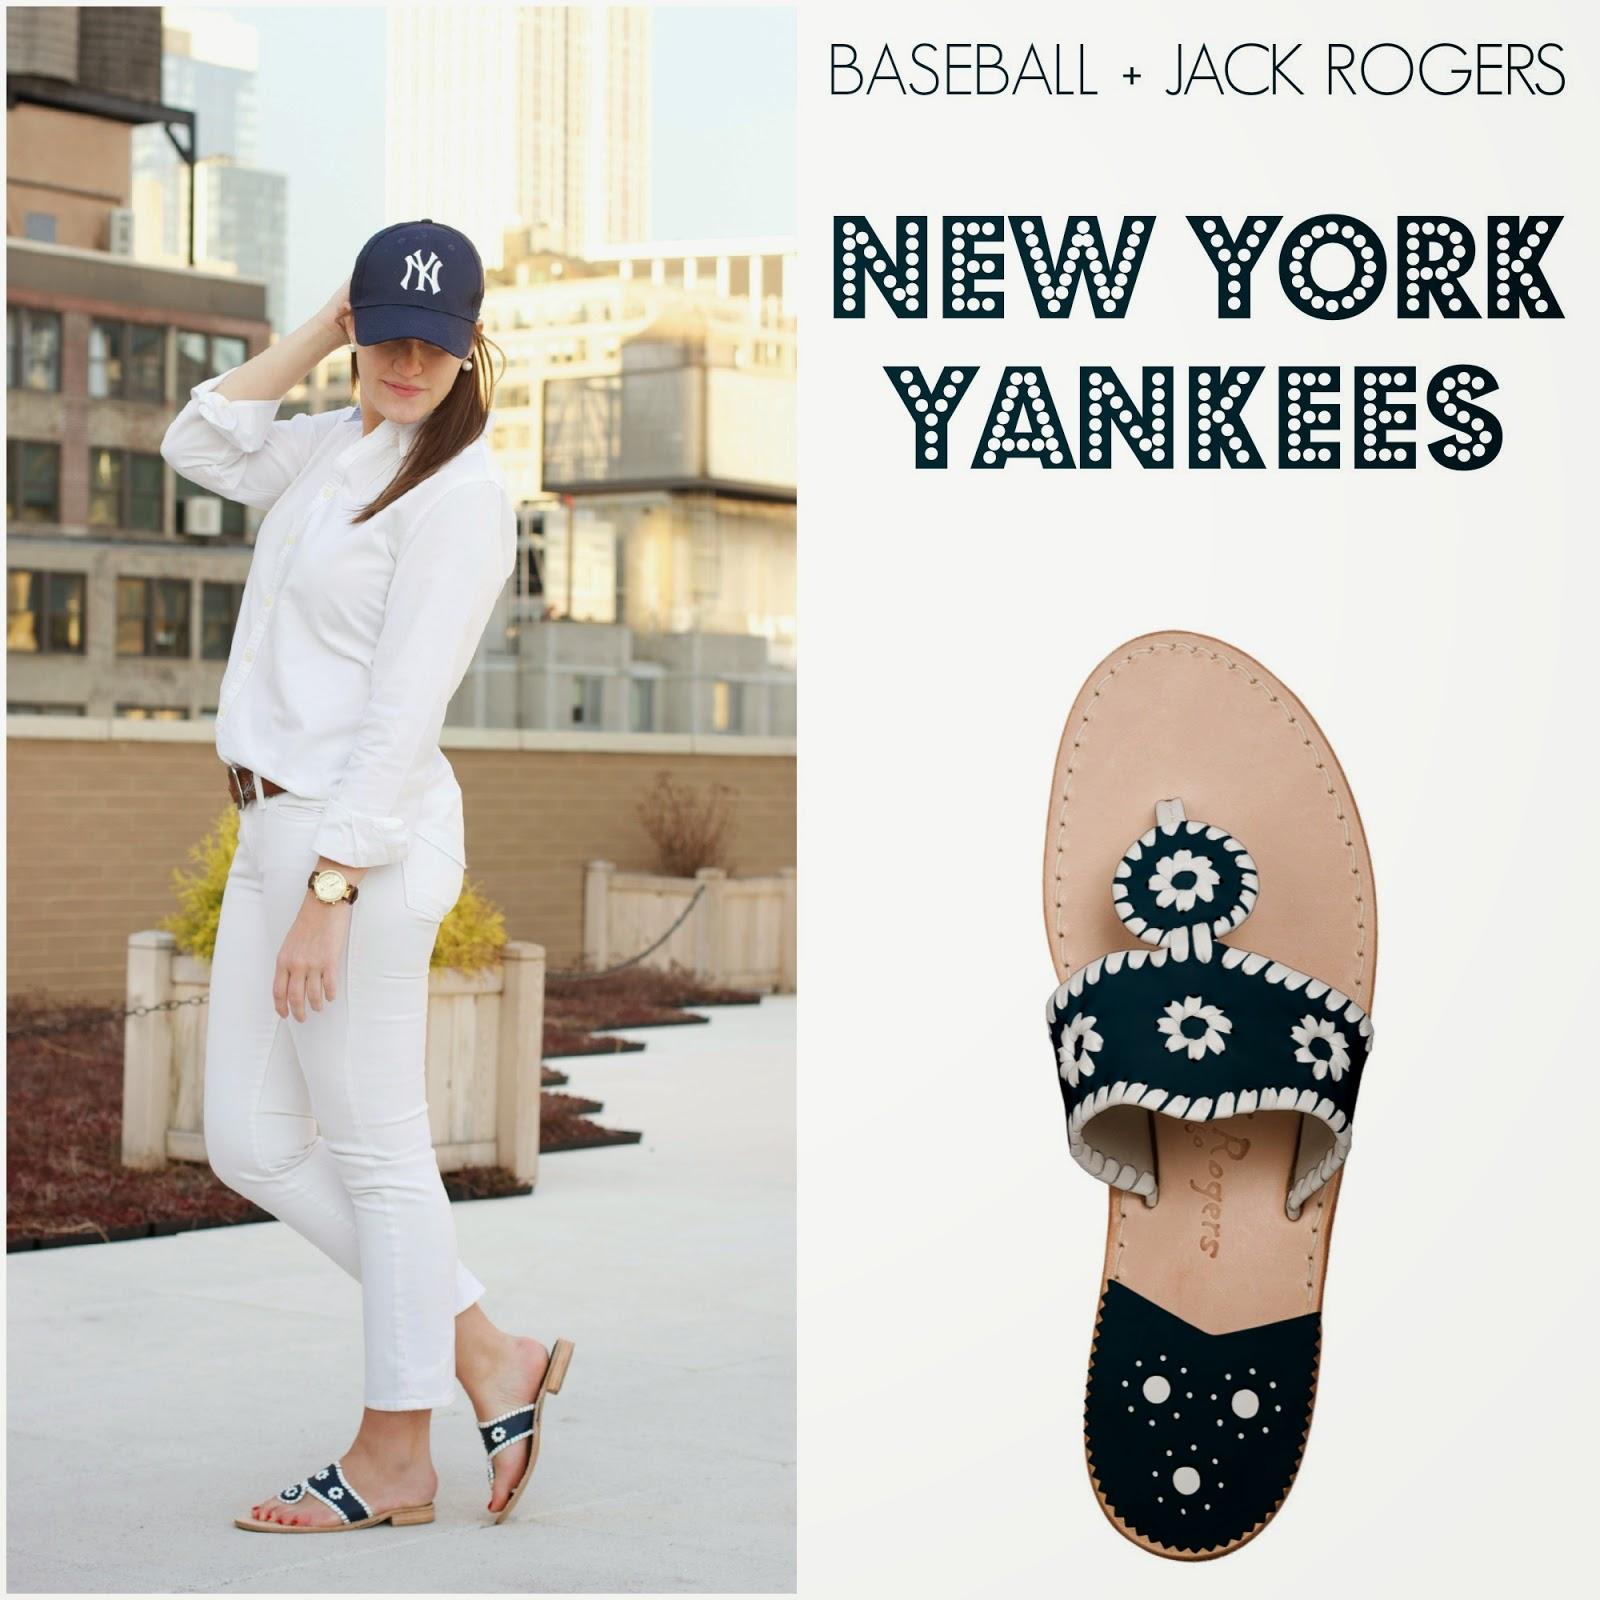 Baseball and Jack Rogers